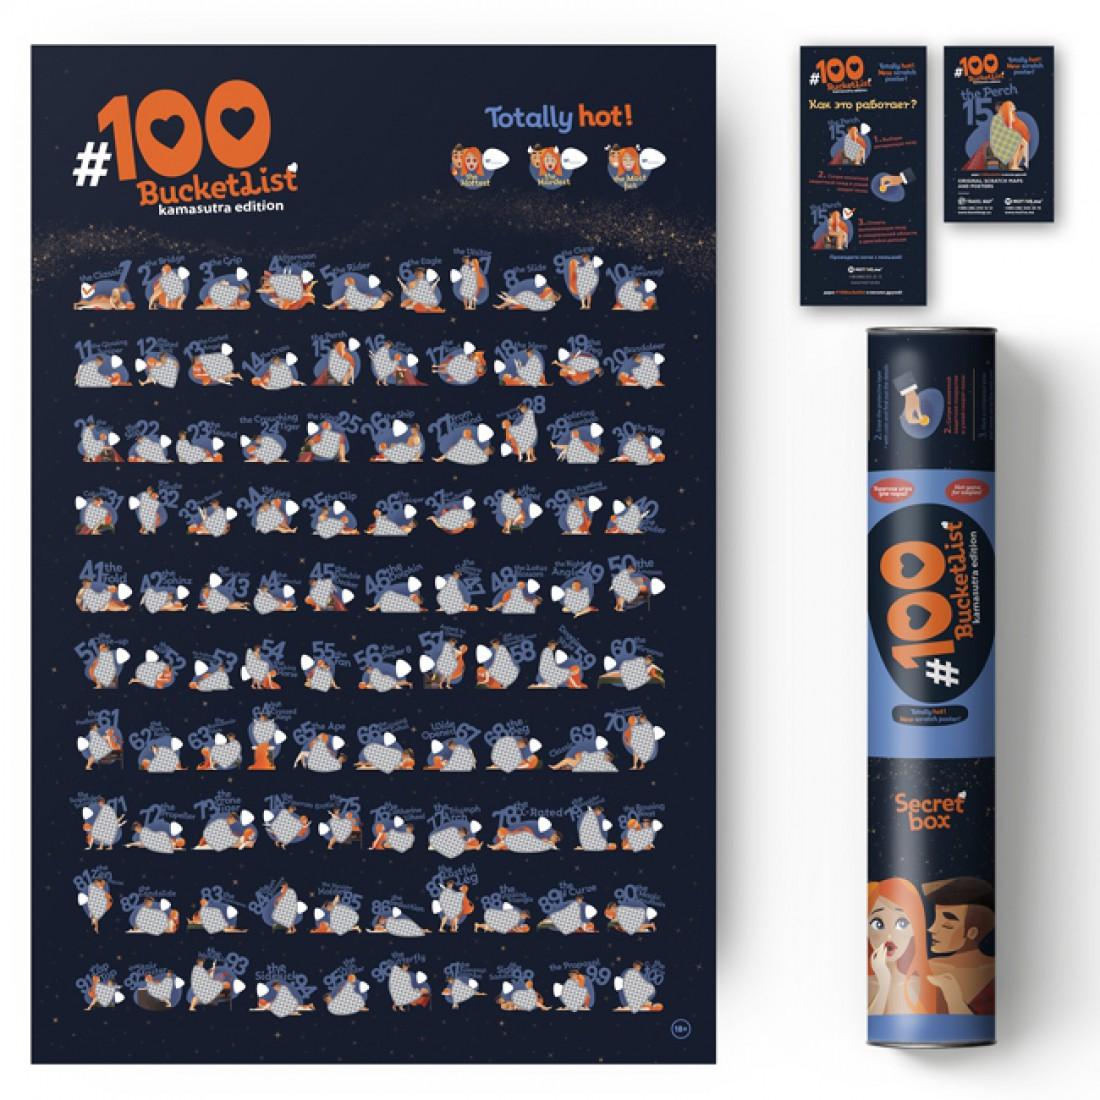 Скретч-постер #100 BucketList KAMASUTRA Edition, 400 грн.